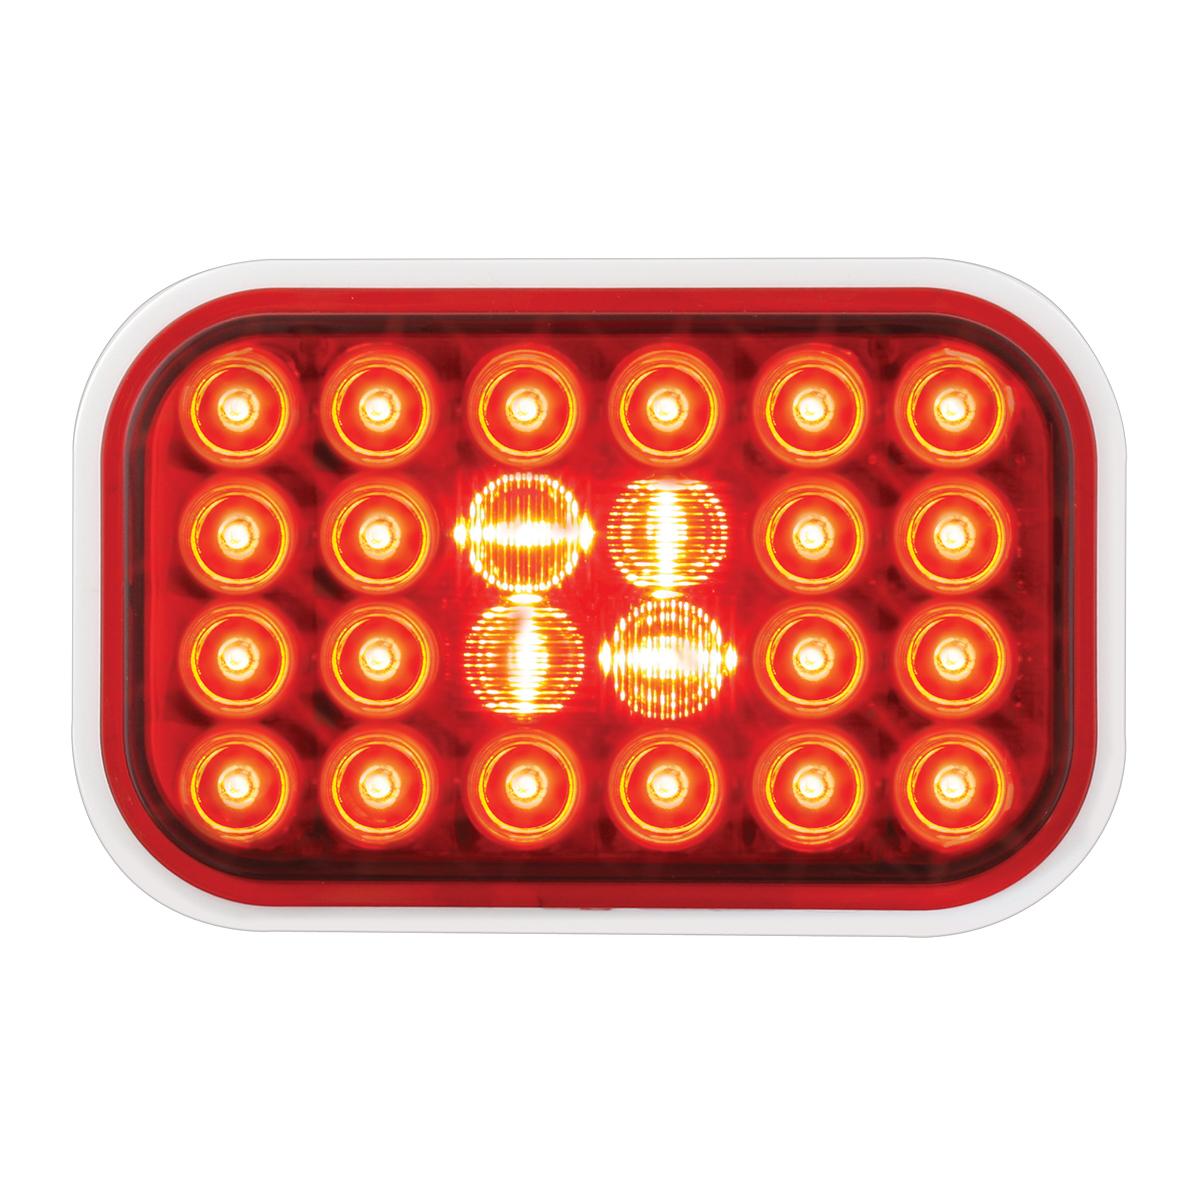 #77182 Rectangular Pearl LED Flat Red/Red Light